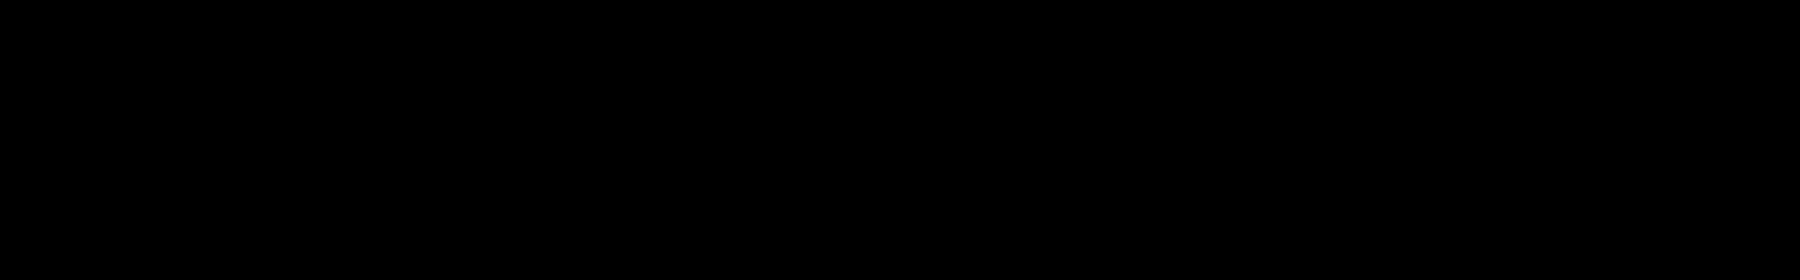 One-Shot Series: Psy Trance Drums audio waveform